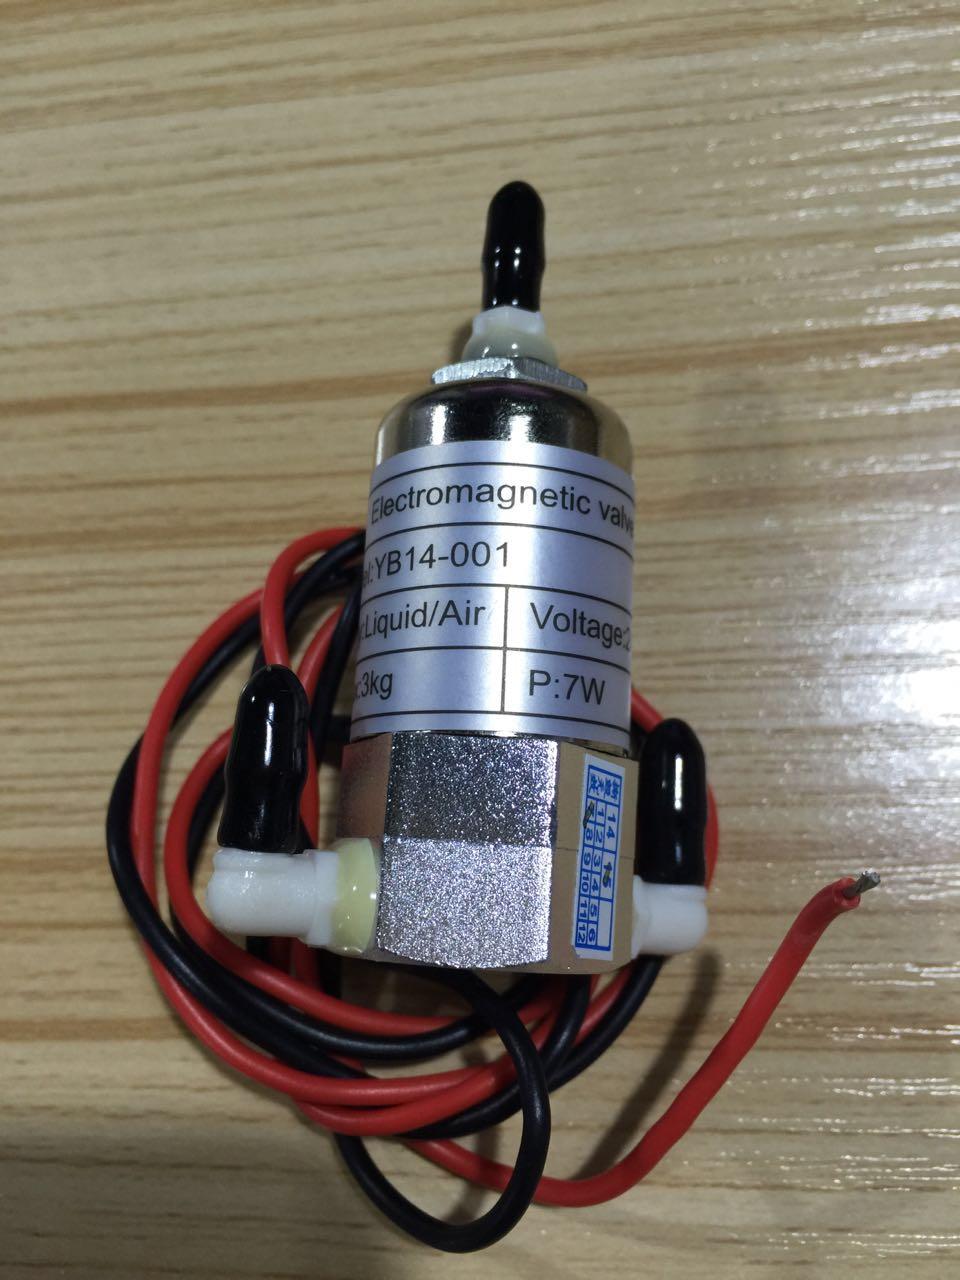 MICRO Electromagnetic 3 WAY SOLENOID VALVE 24 V DC for Infiniti Allwin Myjet Zhongye Gongzhen Wit-color JHF Crystal-jet printer